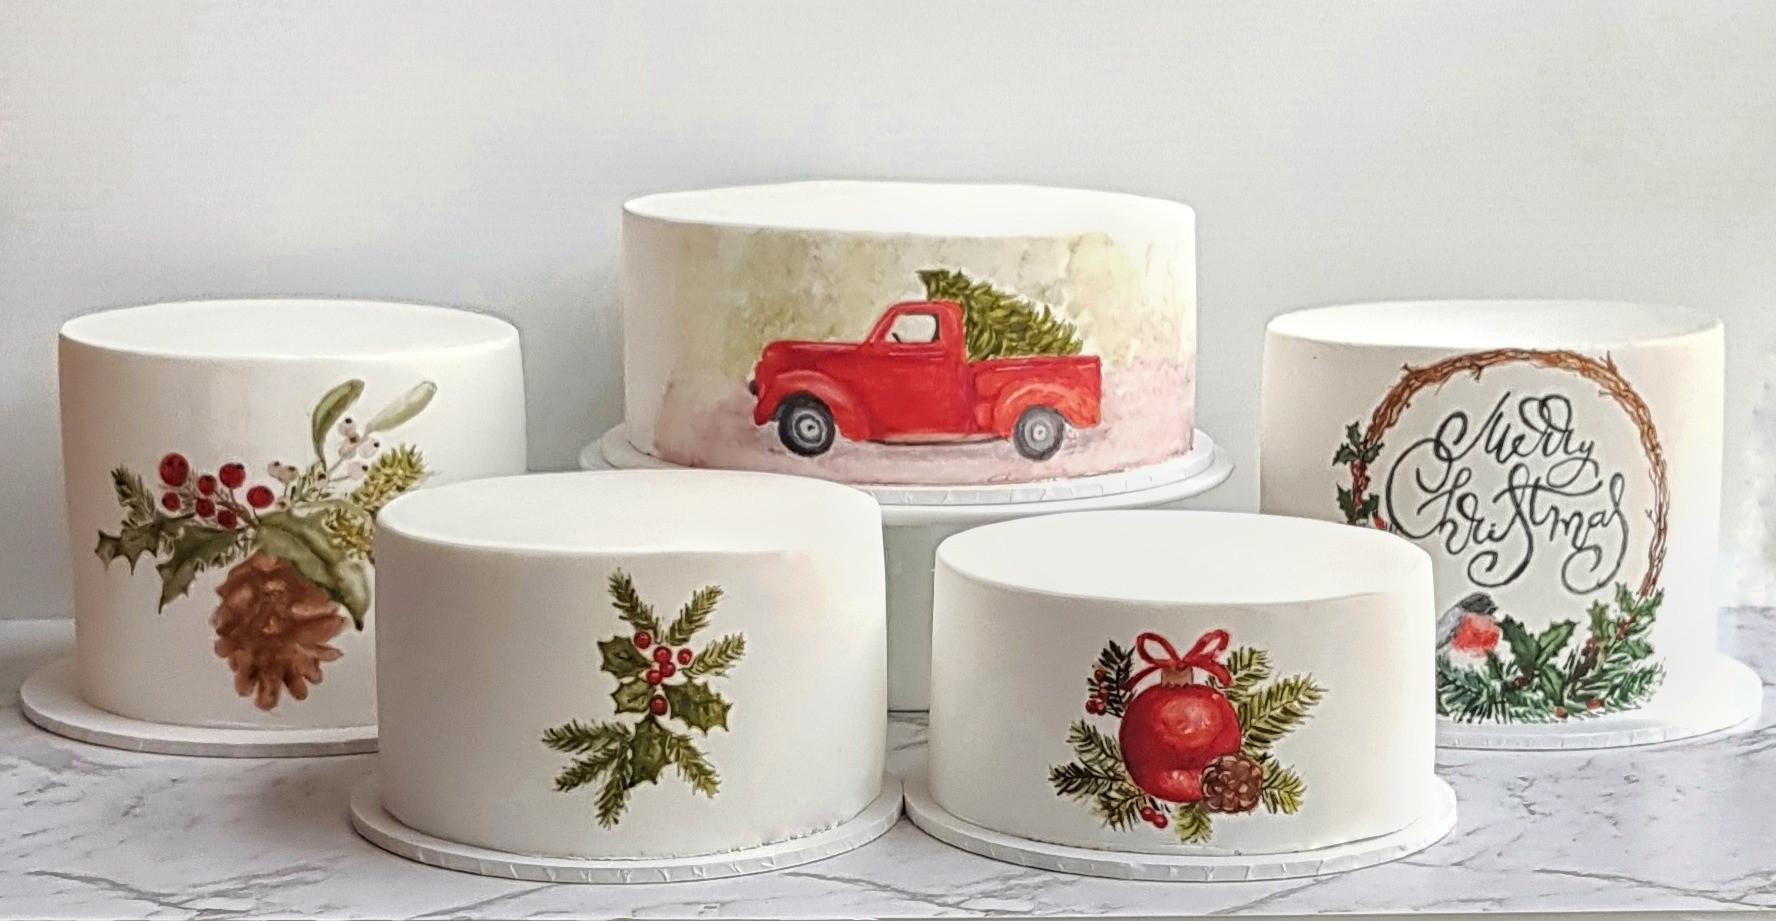 handpainted Christmas cakes